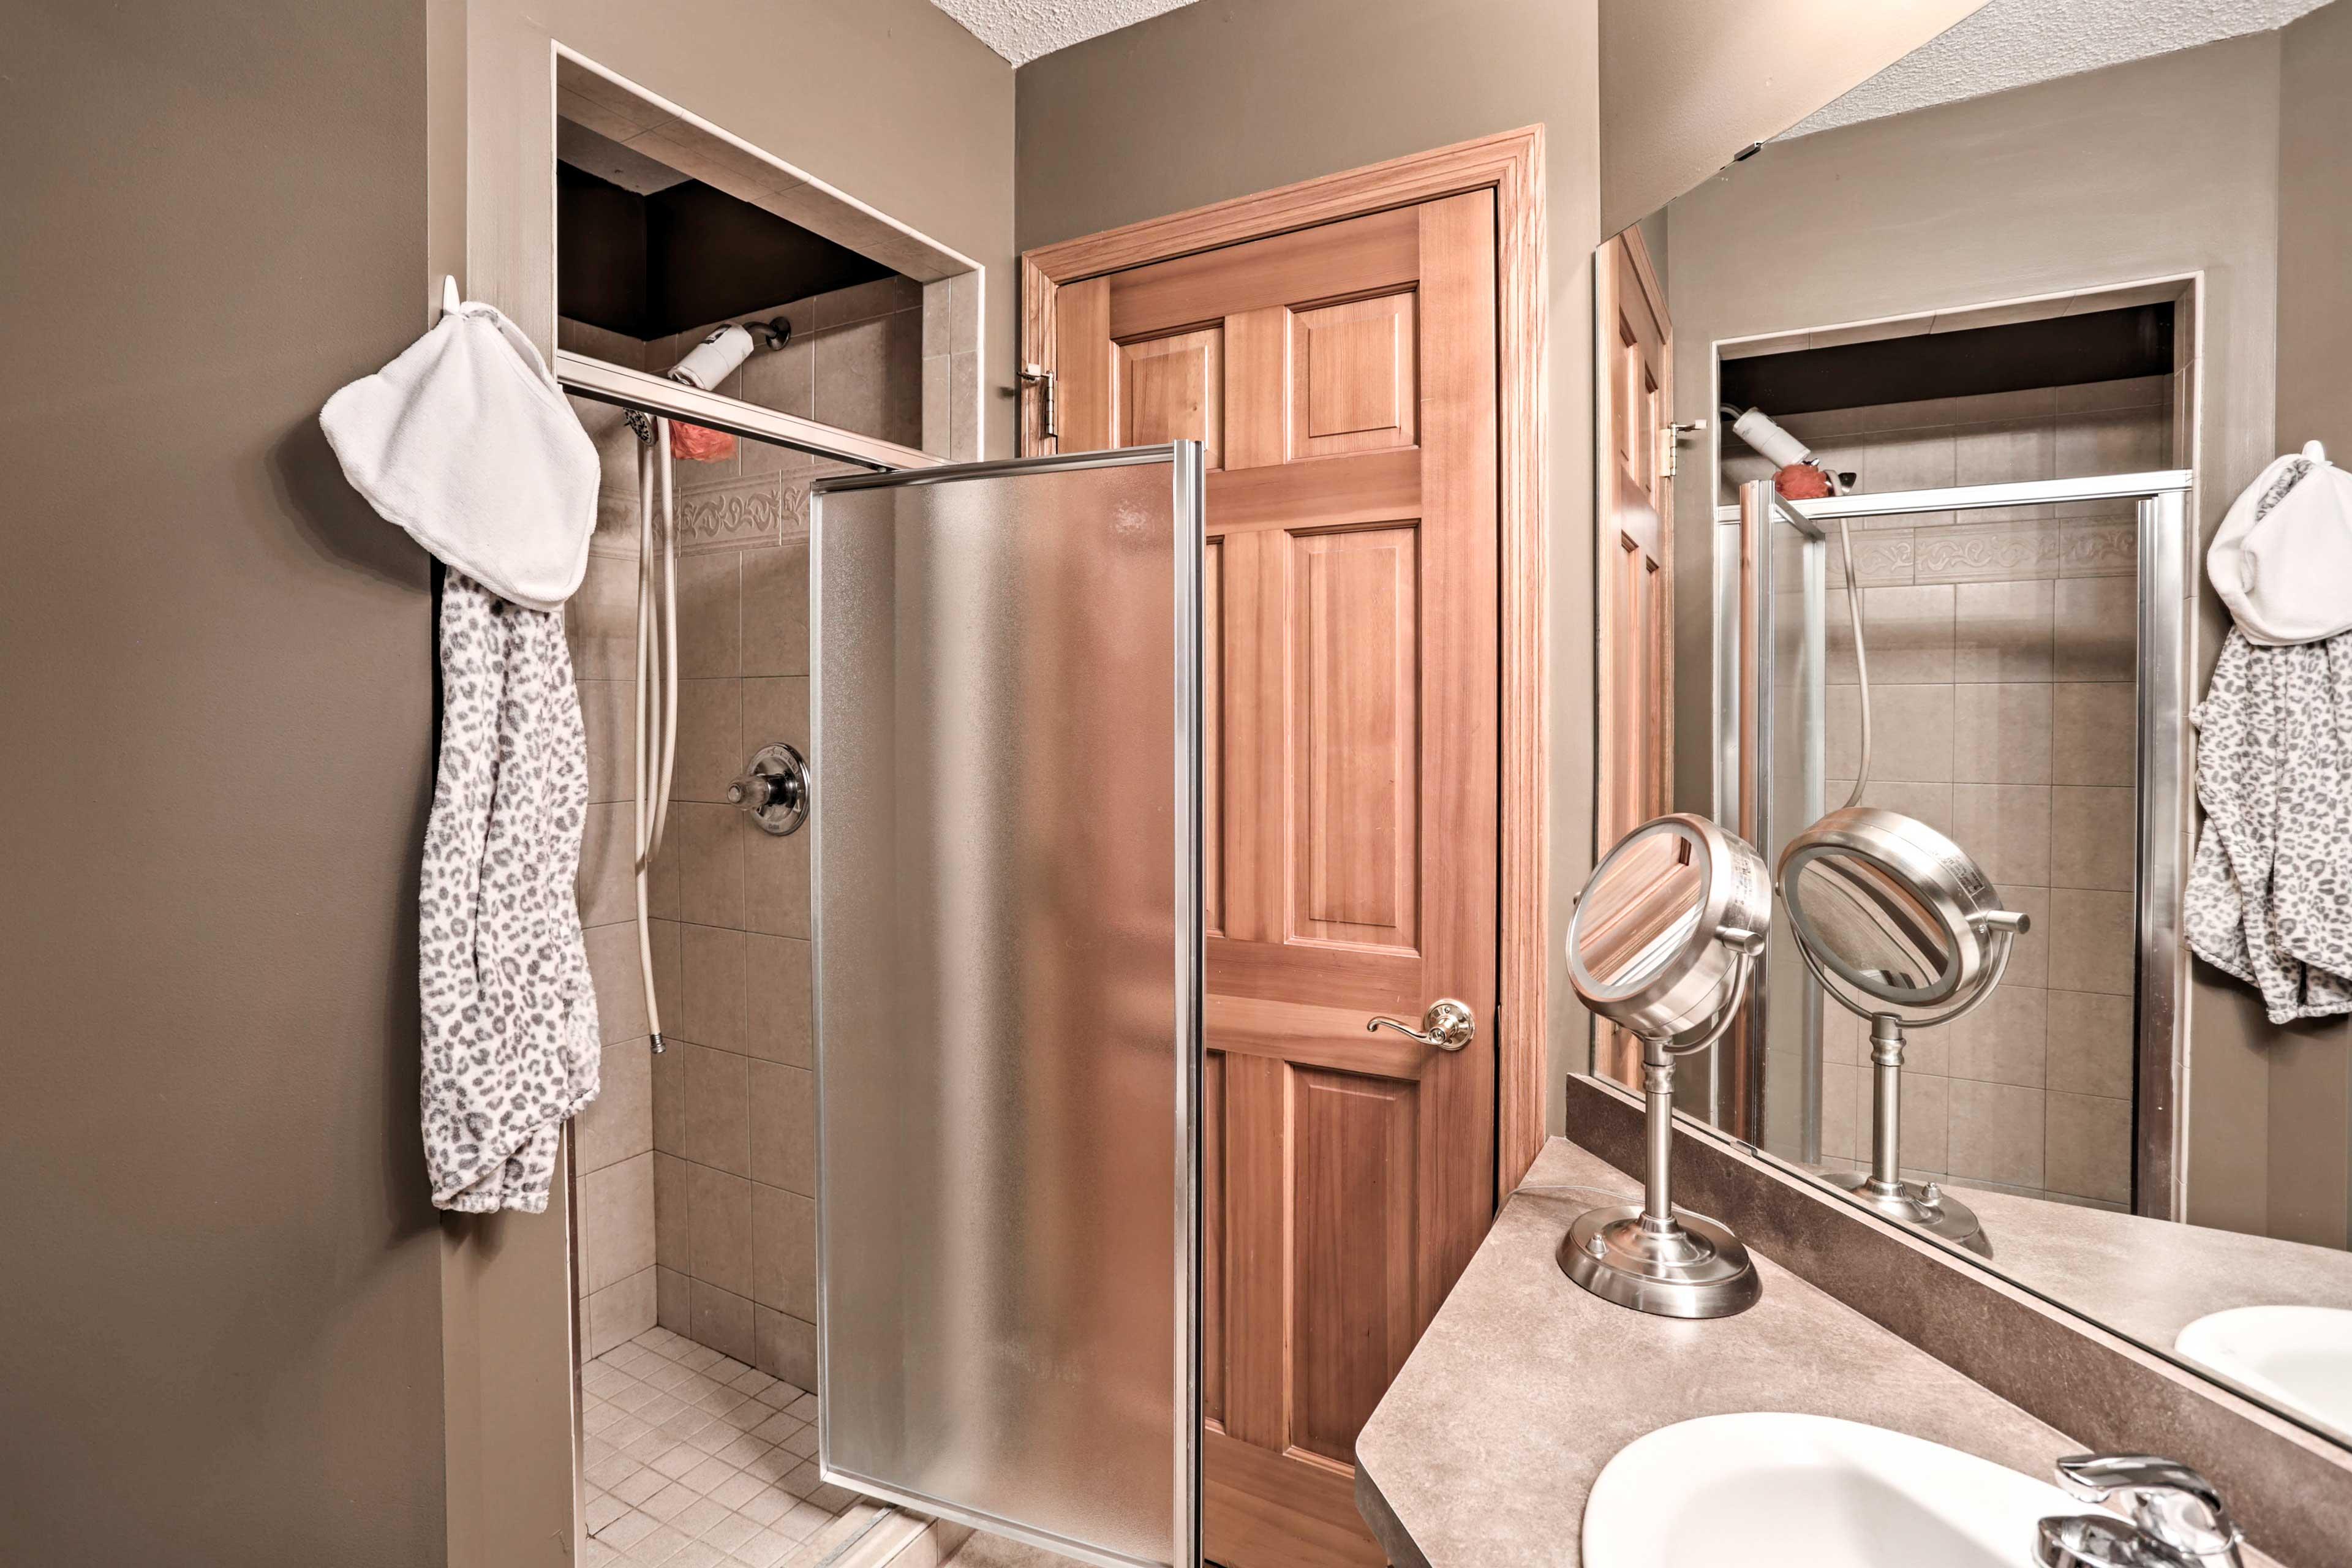 Enjoy a rinse in the walk-in shower.